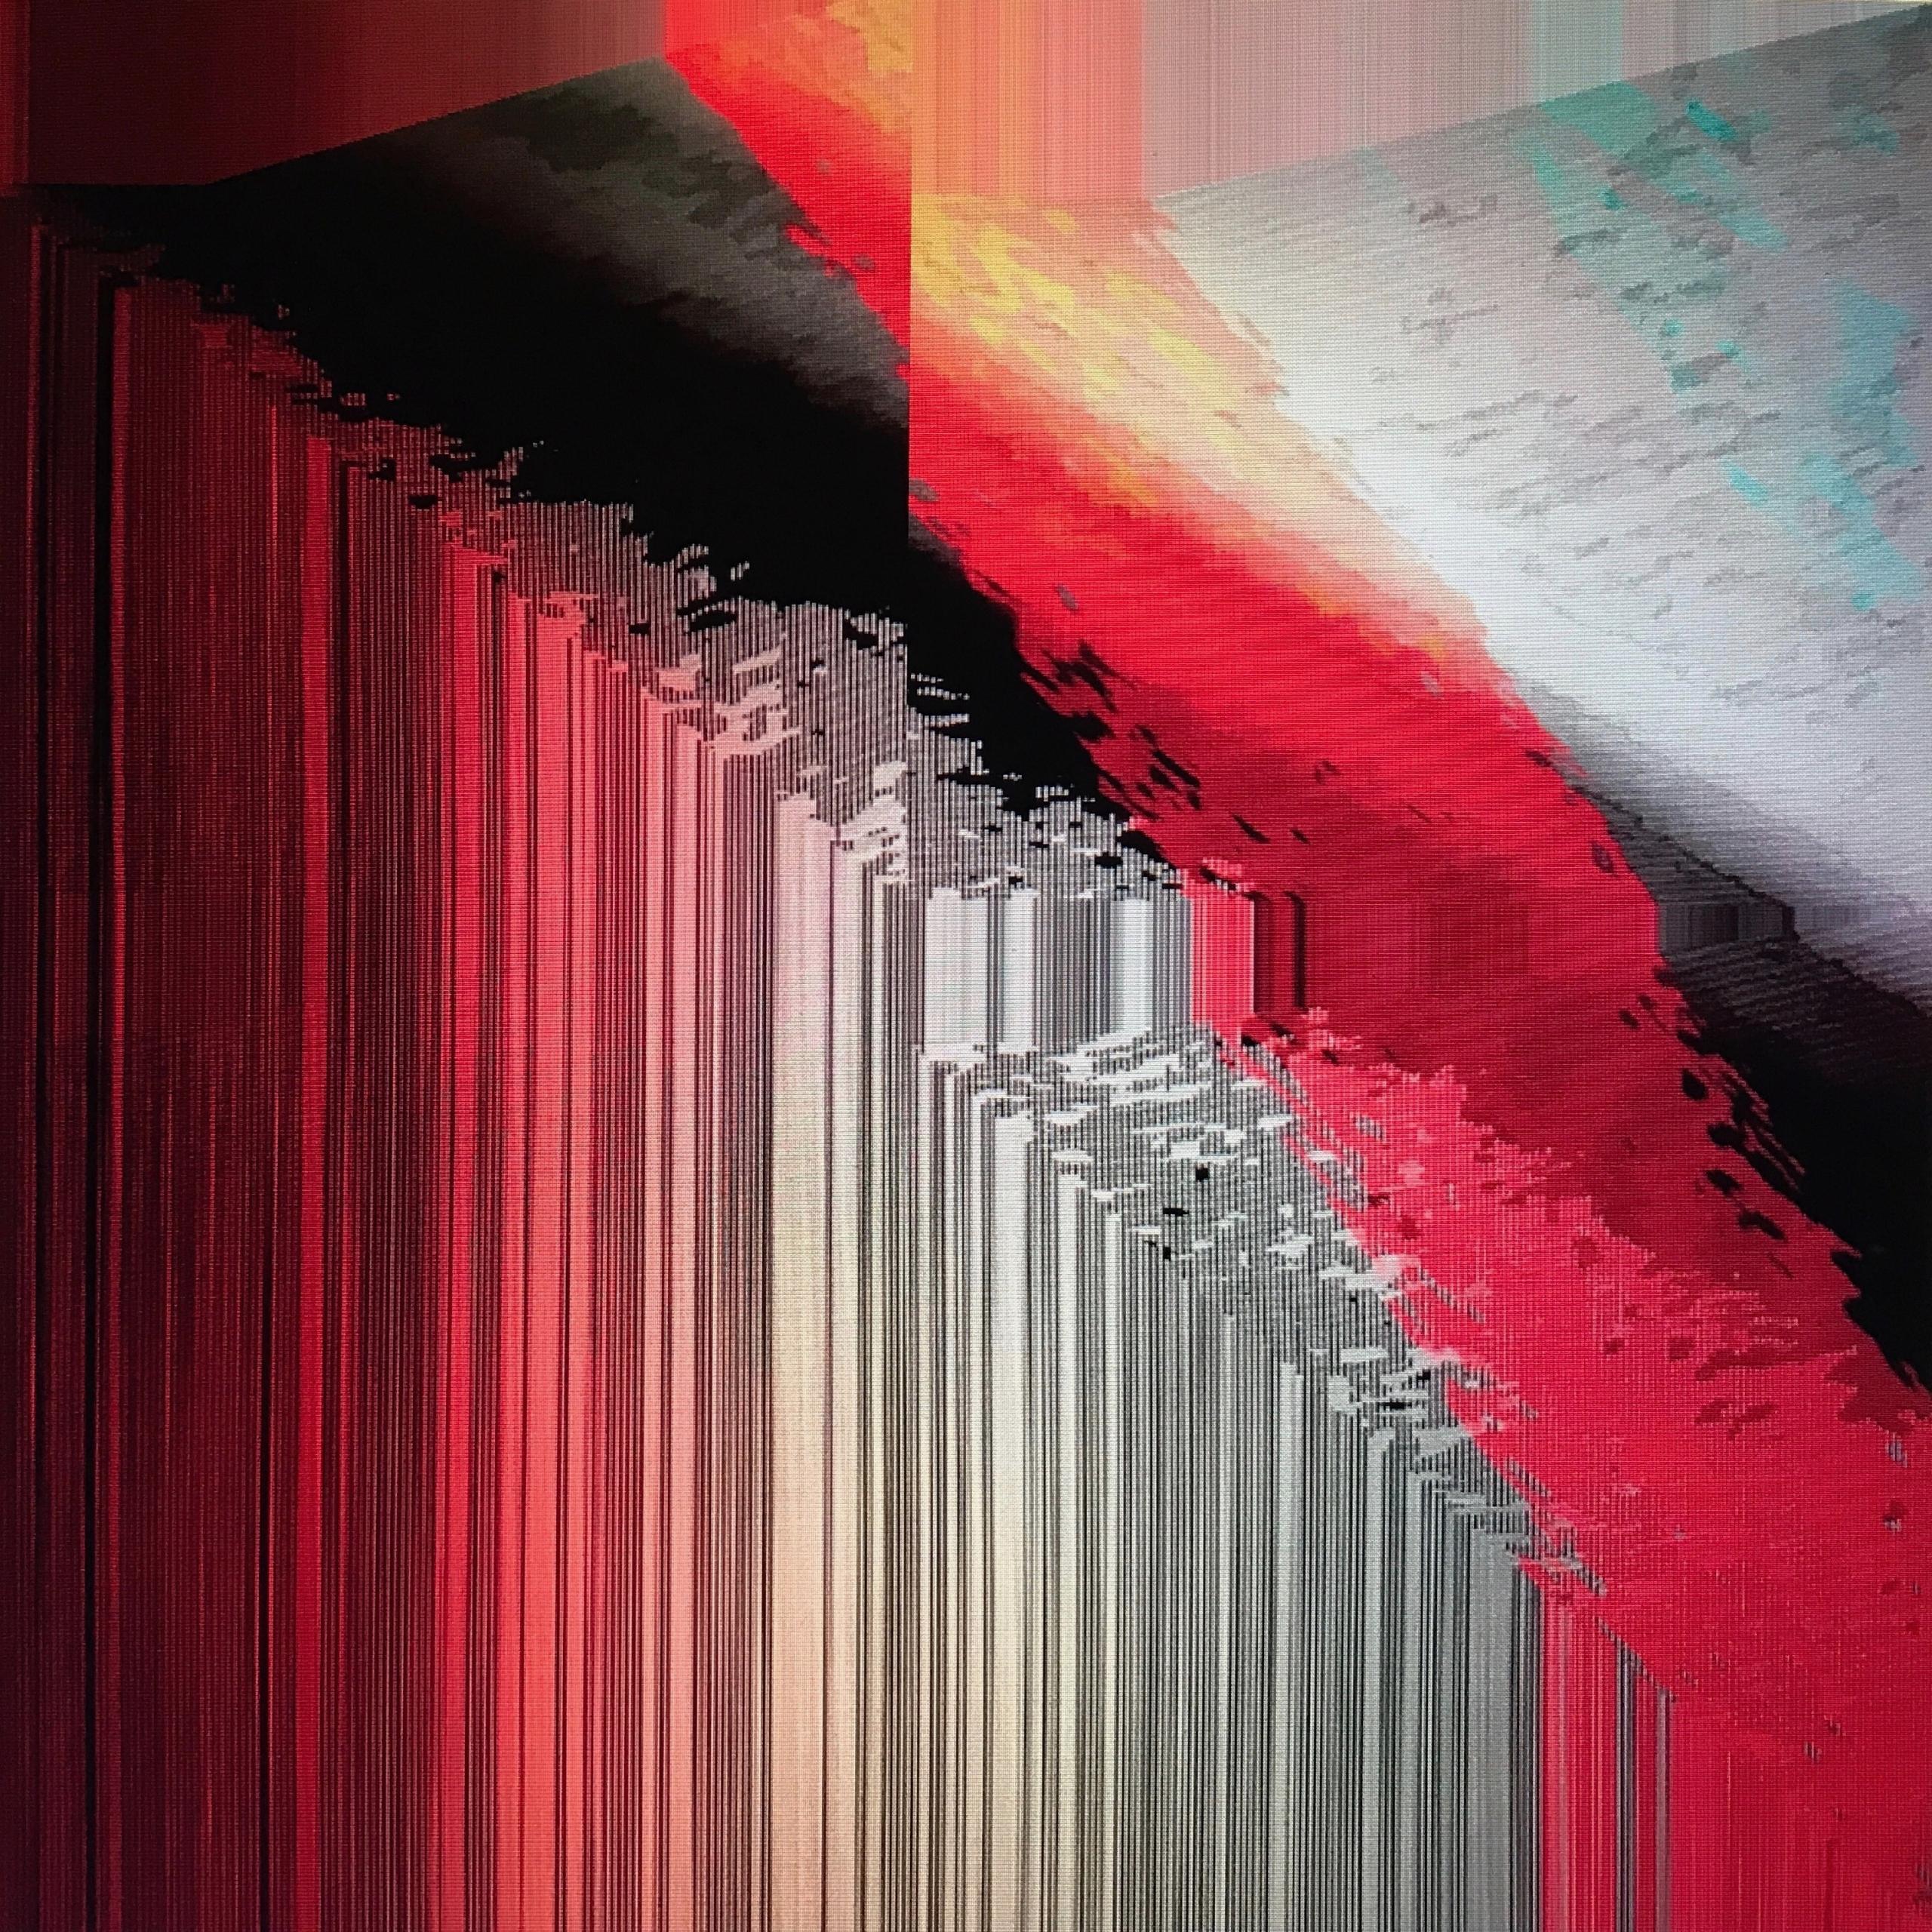 glitch, glitchart, abstract - rdklinc   ello